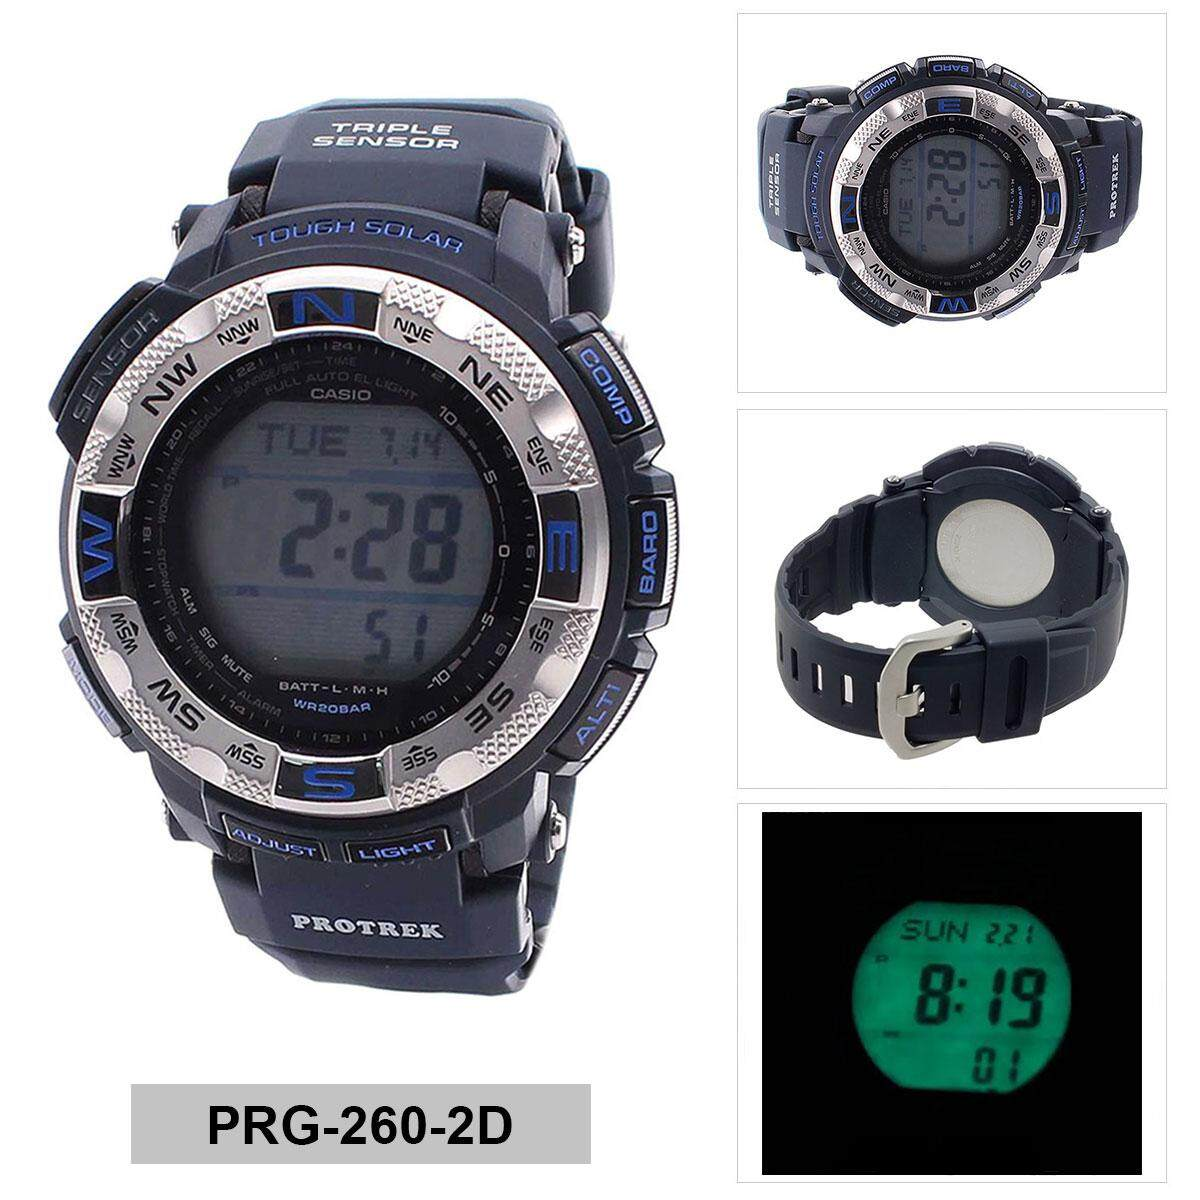 Sell Casio Protrek Prx Cheapest Best Quality Th Store Pro Trek Prg 600yb 3 Thb 5270